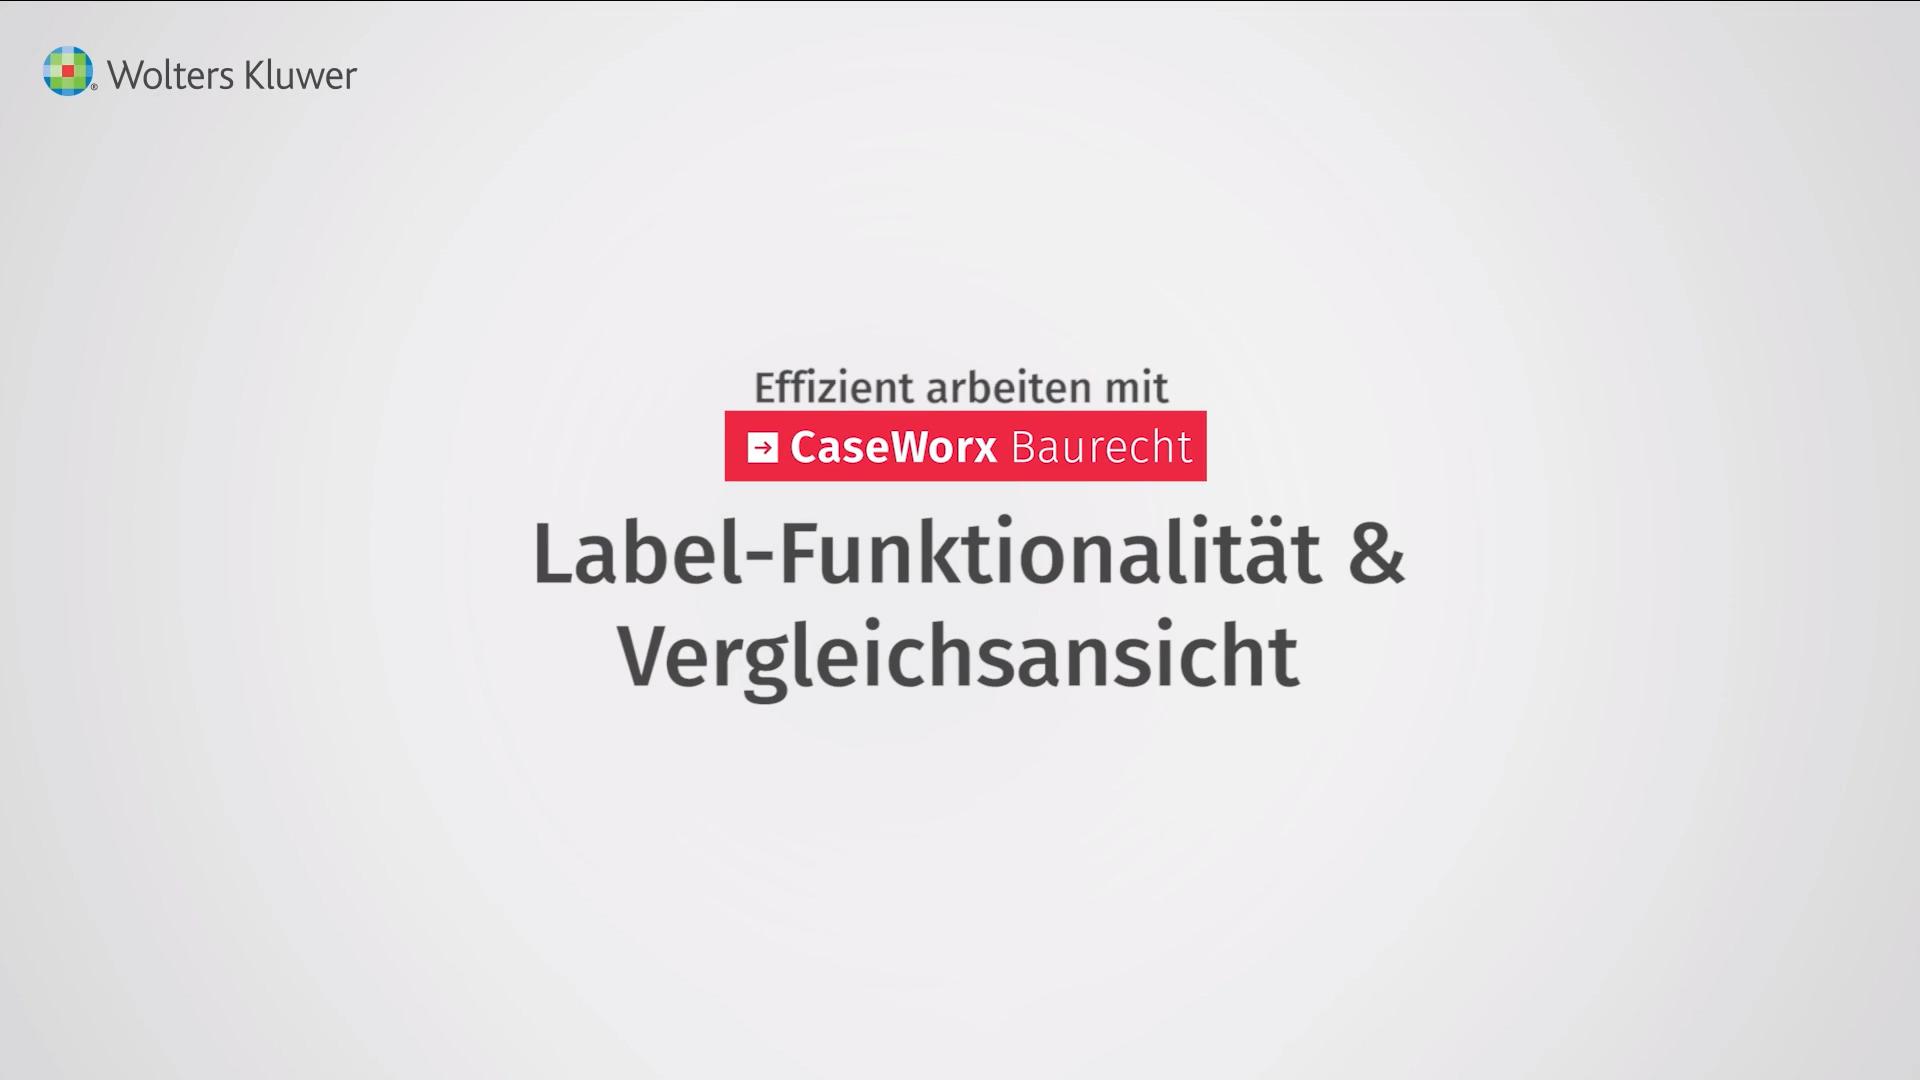 Label-Funktionalität